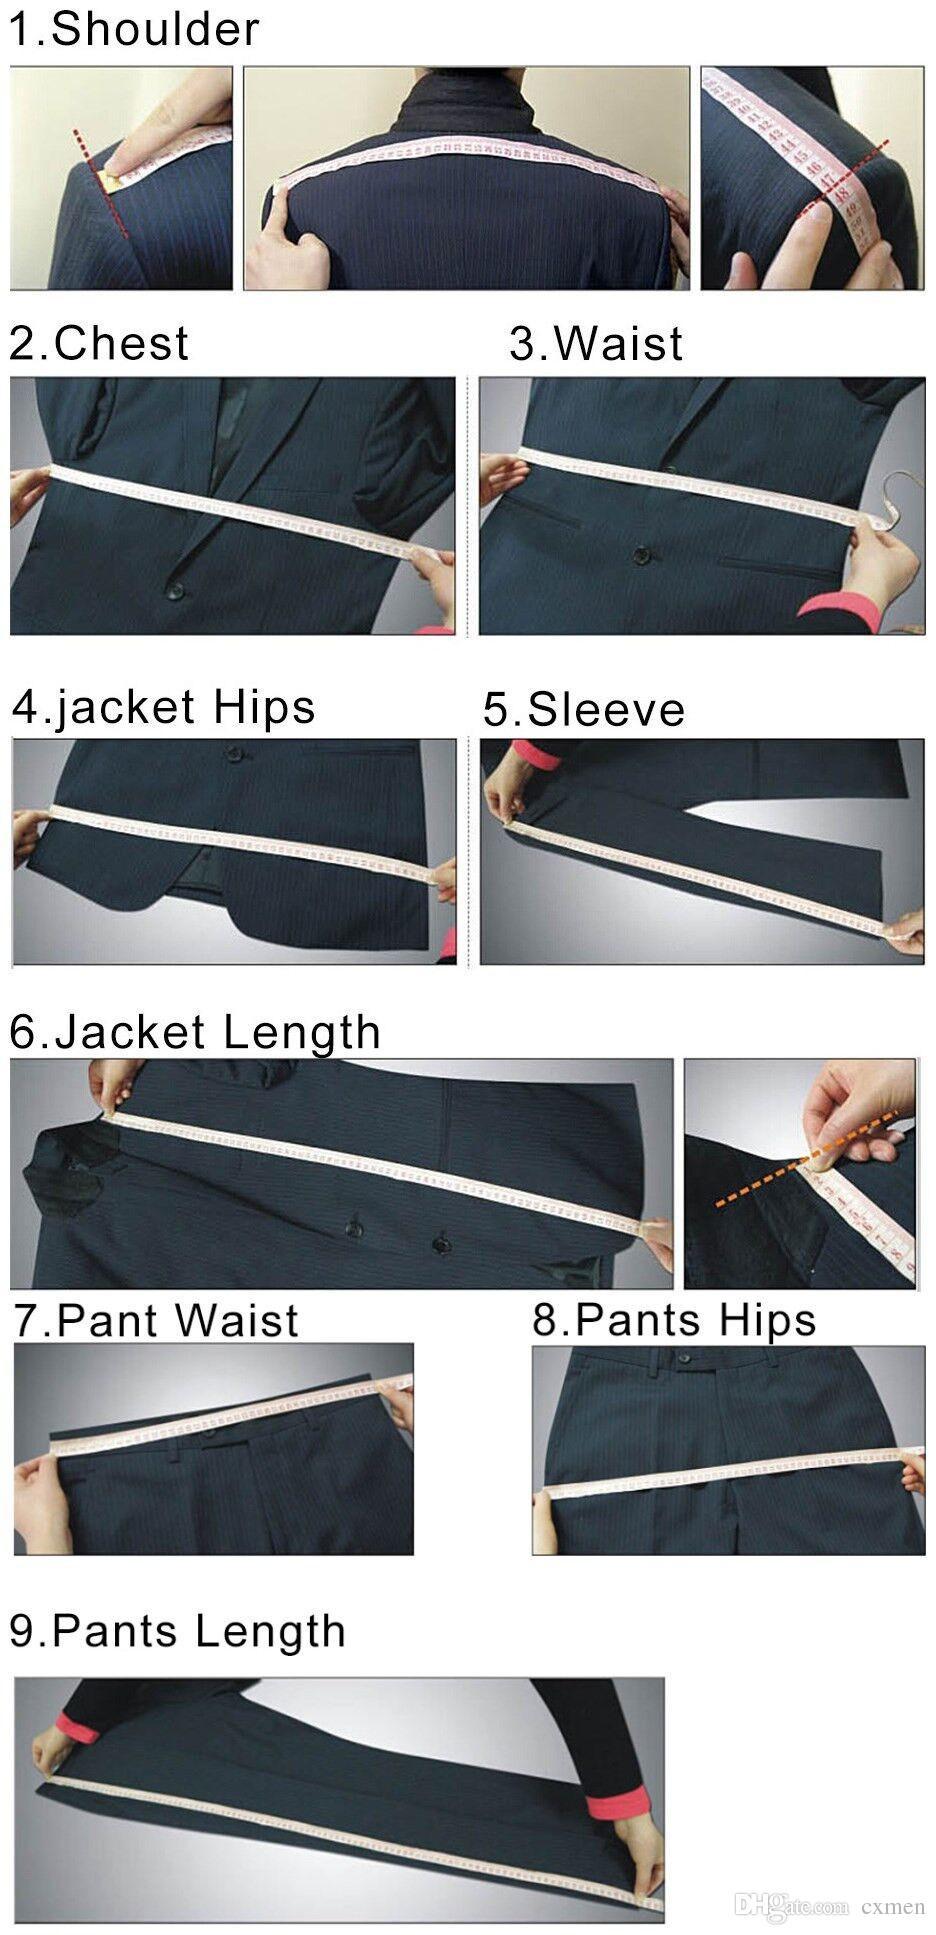 Black Shawl Lapel Custom Made Groom Wear Vintage Men Suits Wedding Tuxedos Groomsmen Formal Blazer White Suits Prom Jacket+Pants